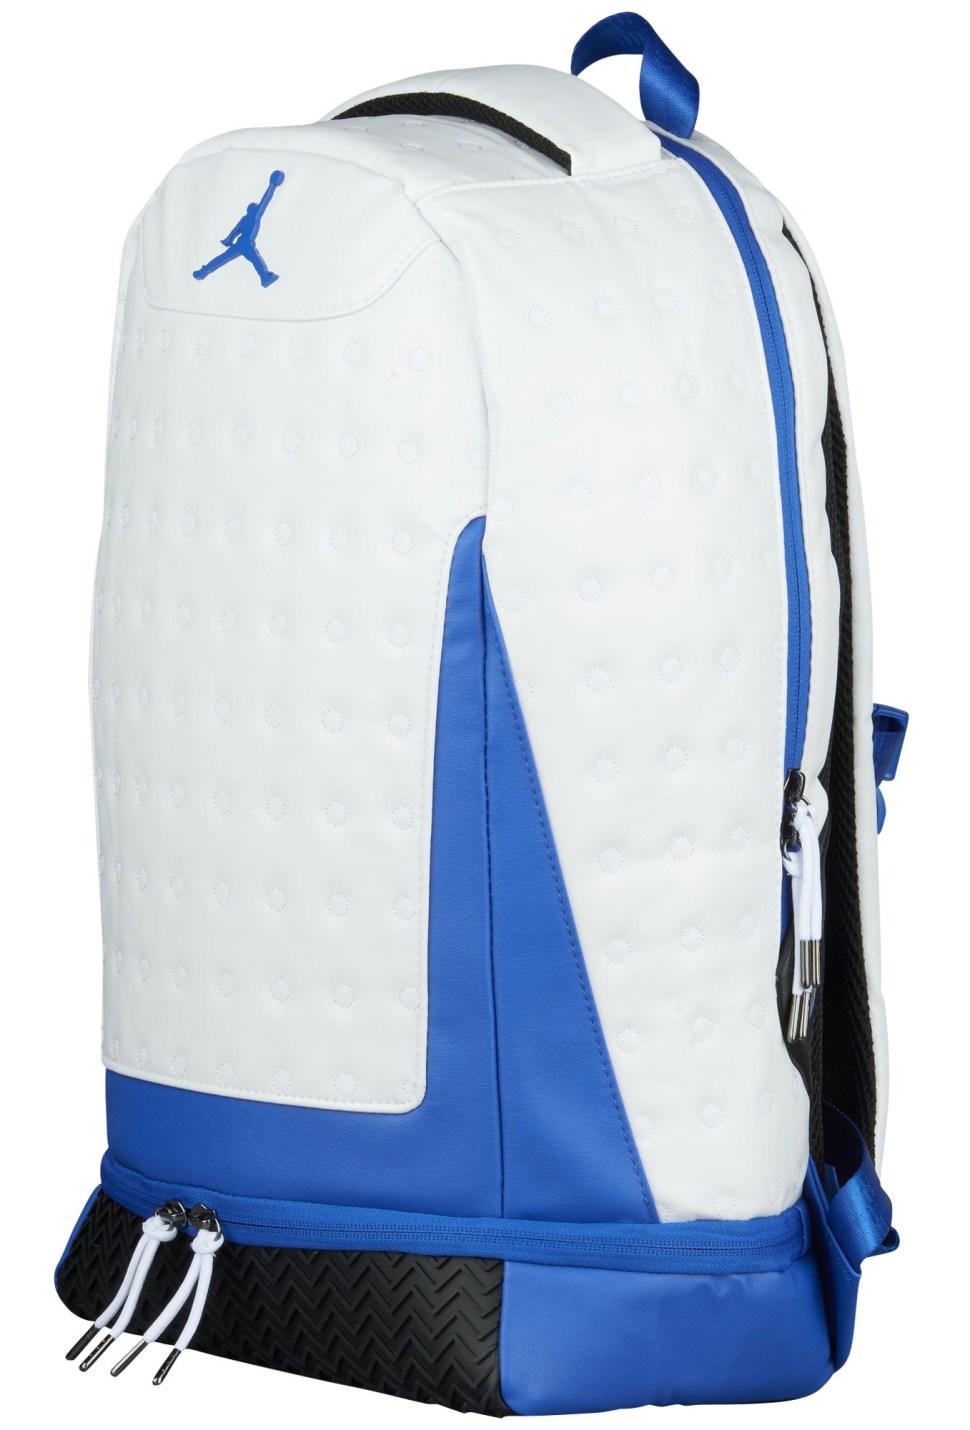 sports shoes c722f 30701 Jordan Retro 13 Hyper Royal Backpack | SportFits.com